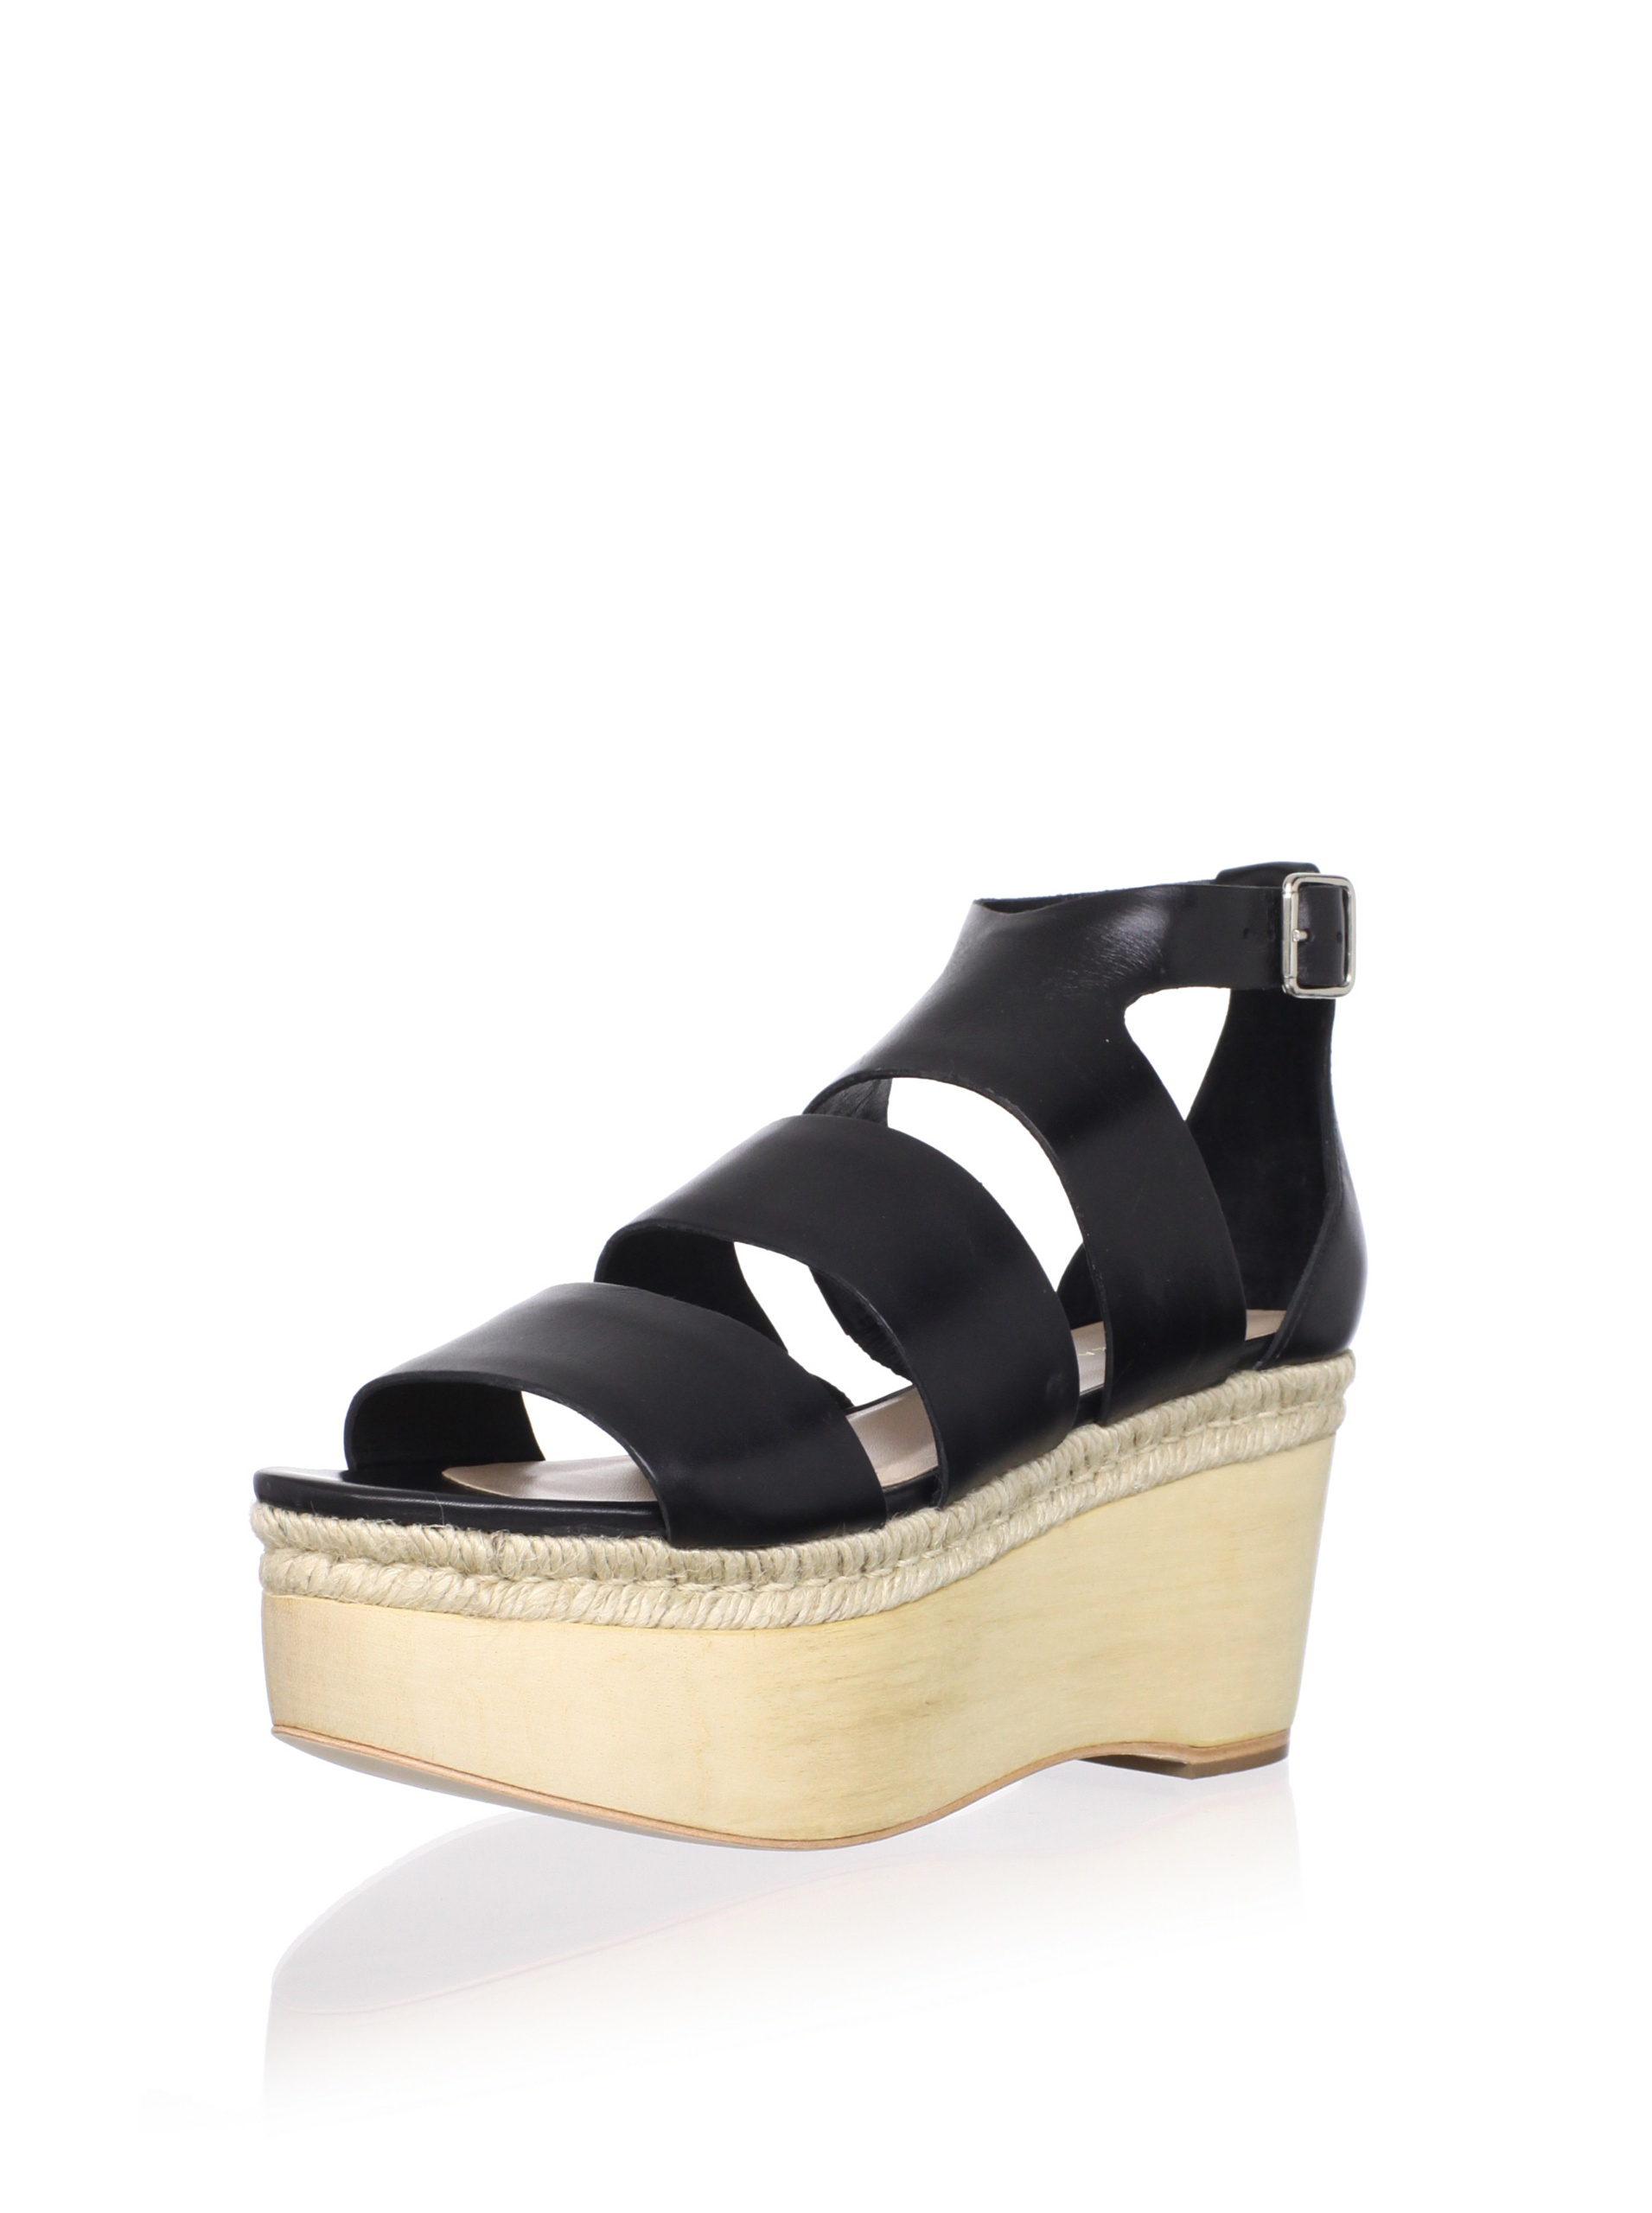 Loeffler Randall Women's Sasha Platform Sandal (Black)